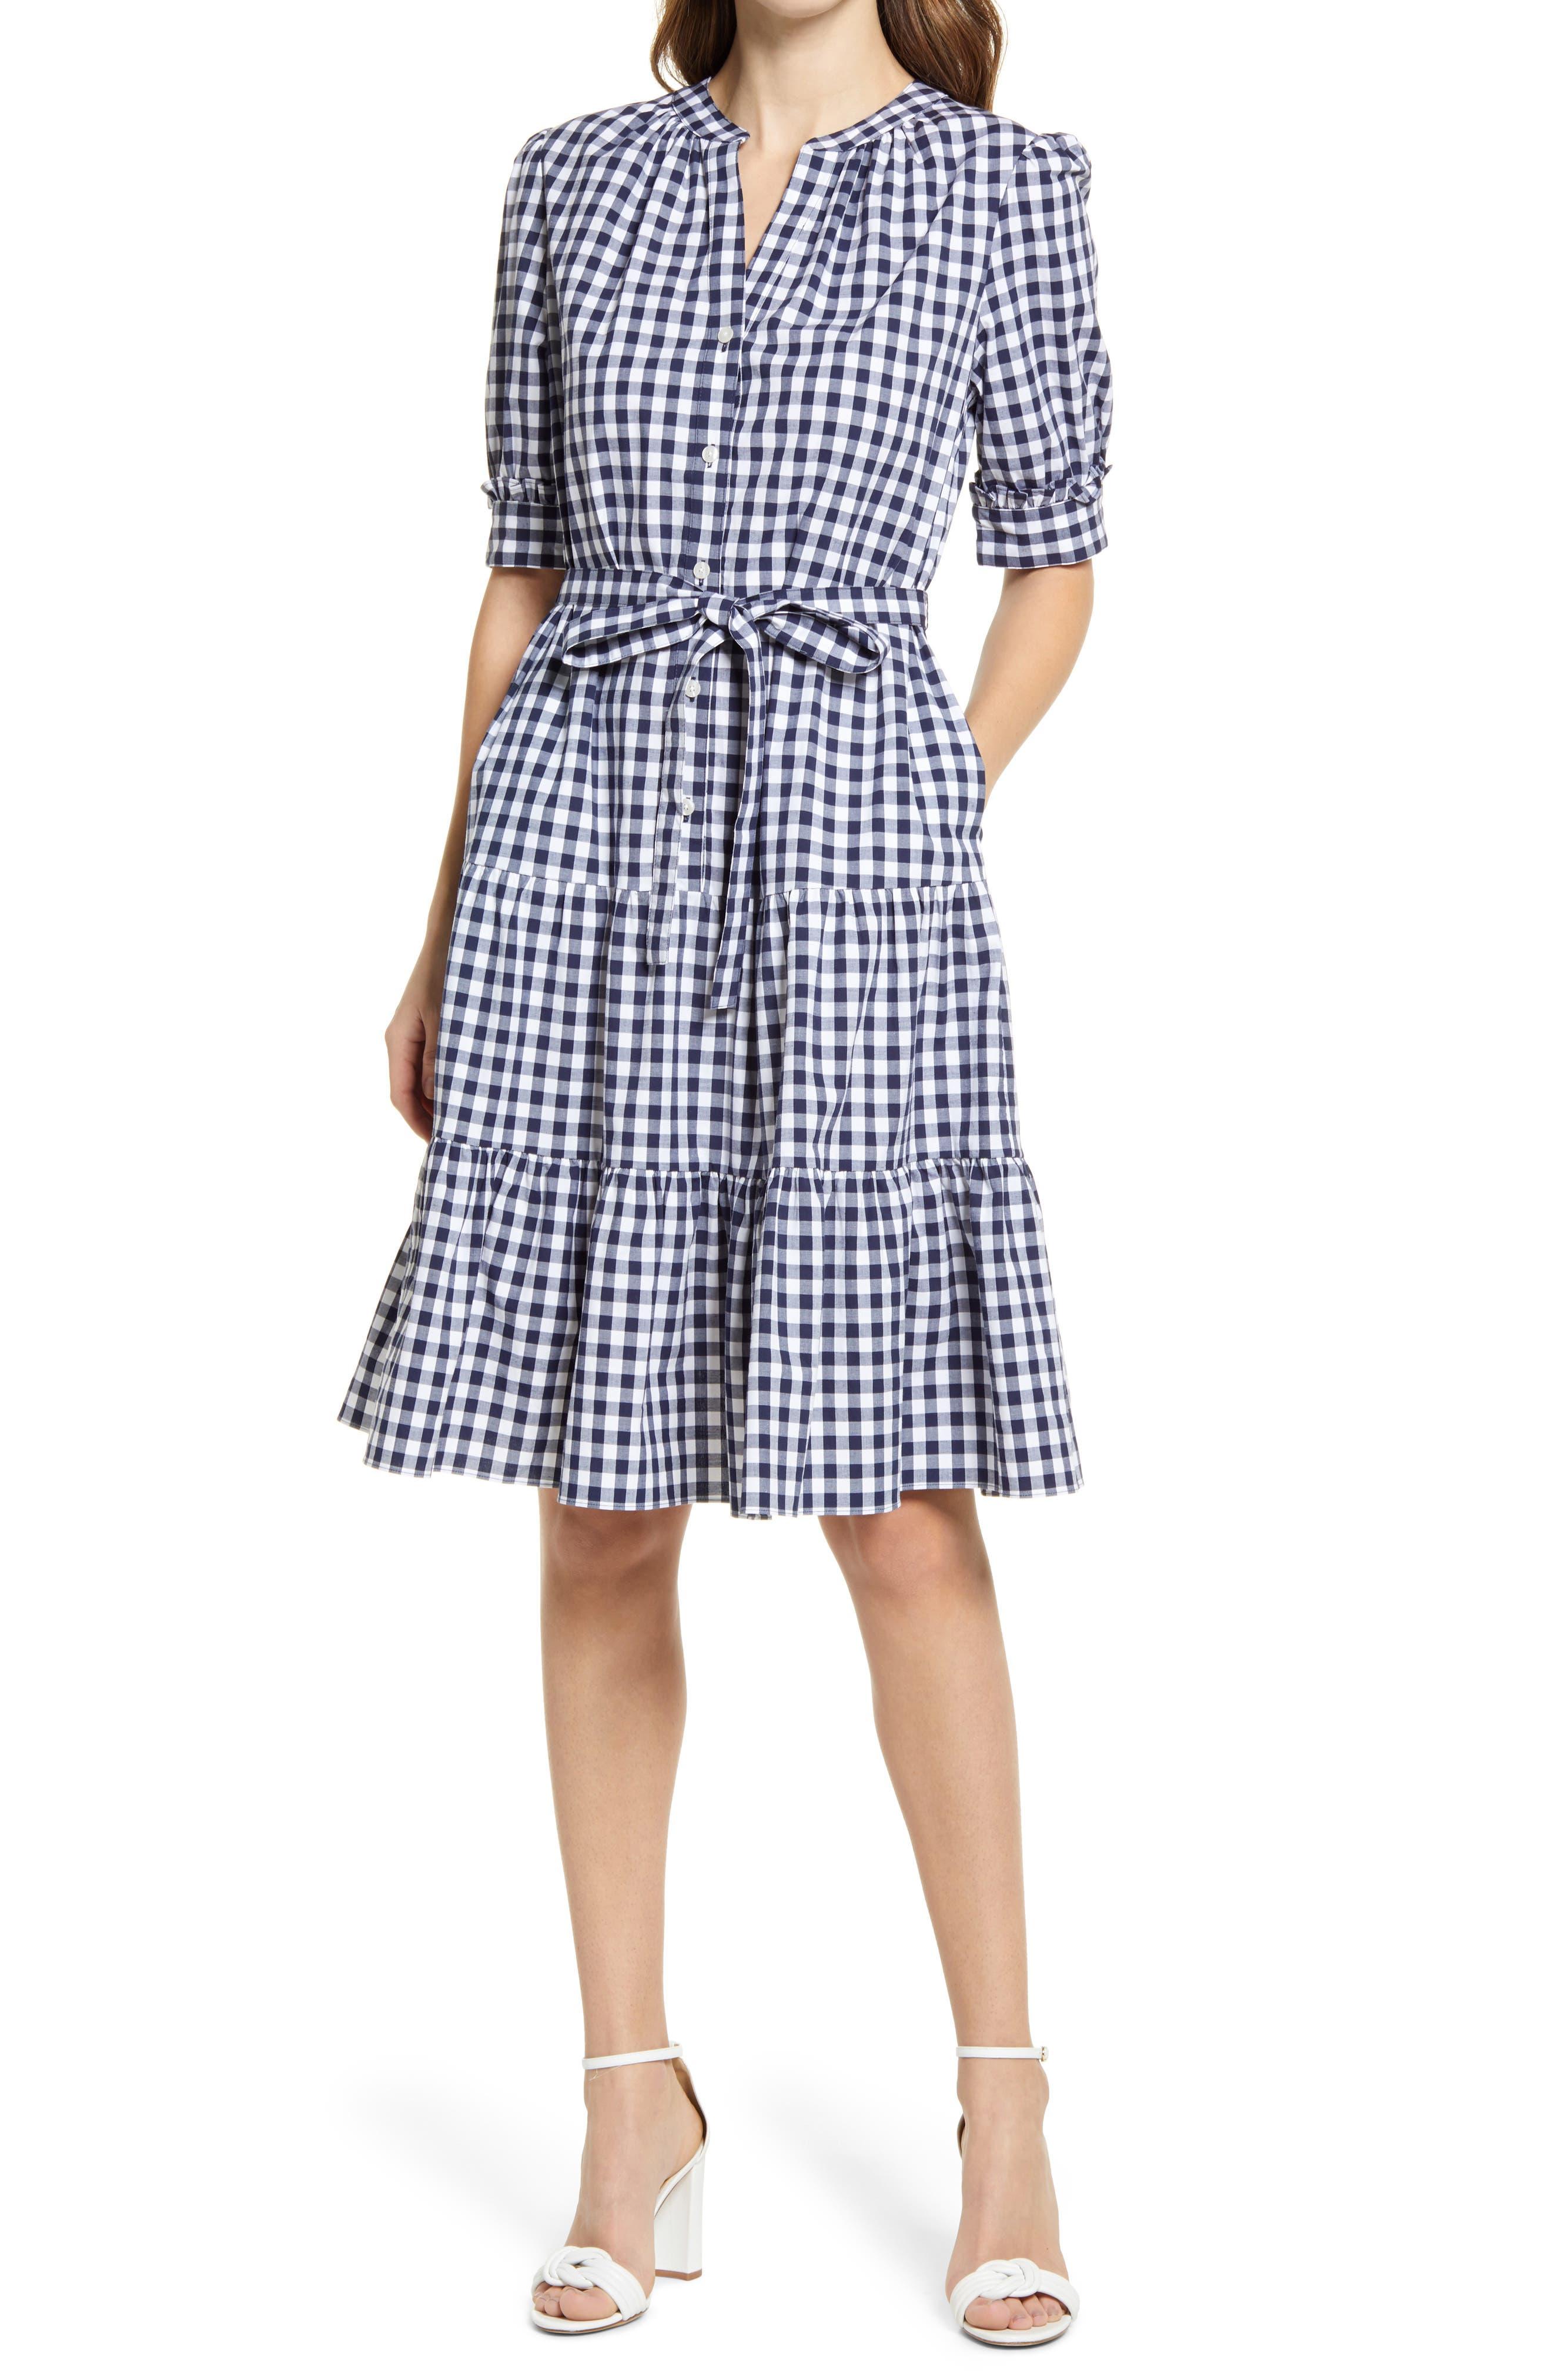 Puff Sleeve Stretch Cotton Dress